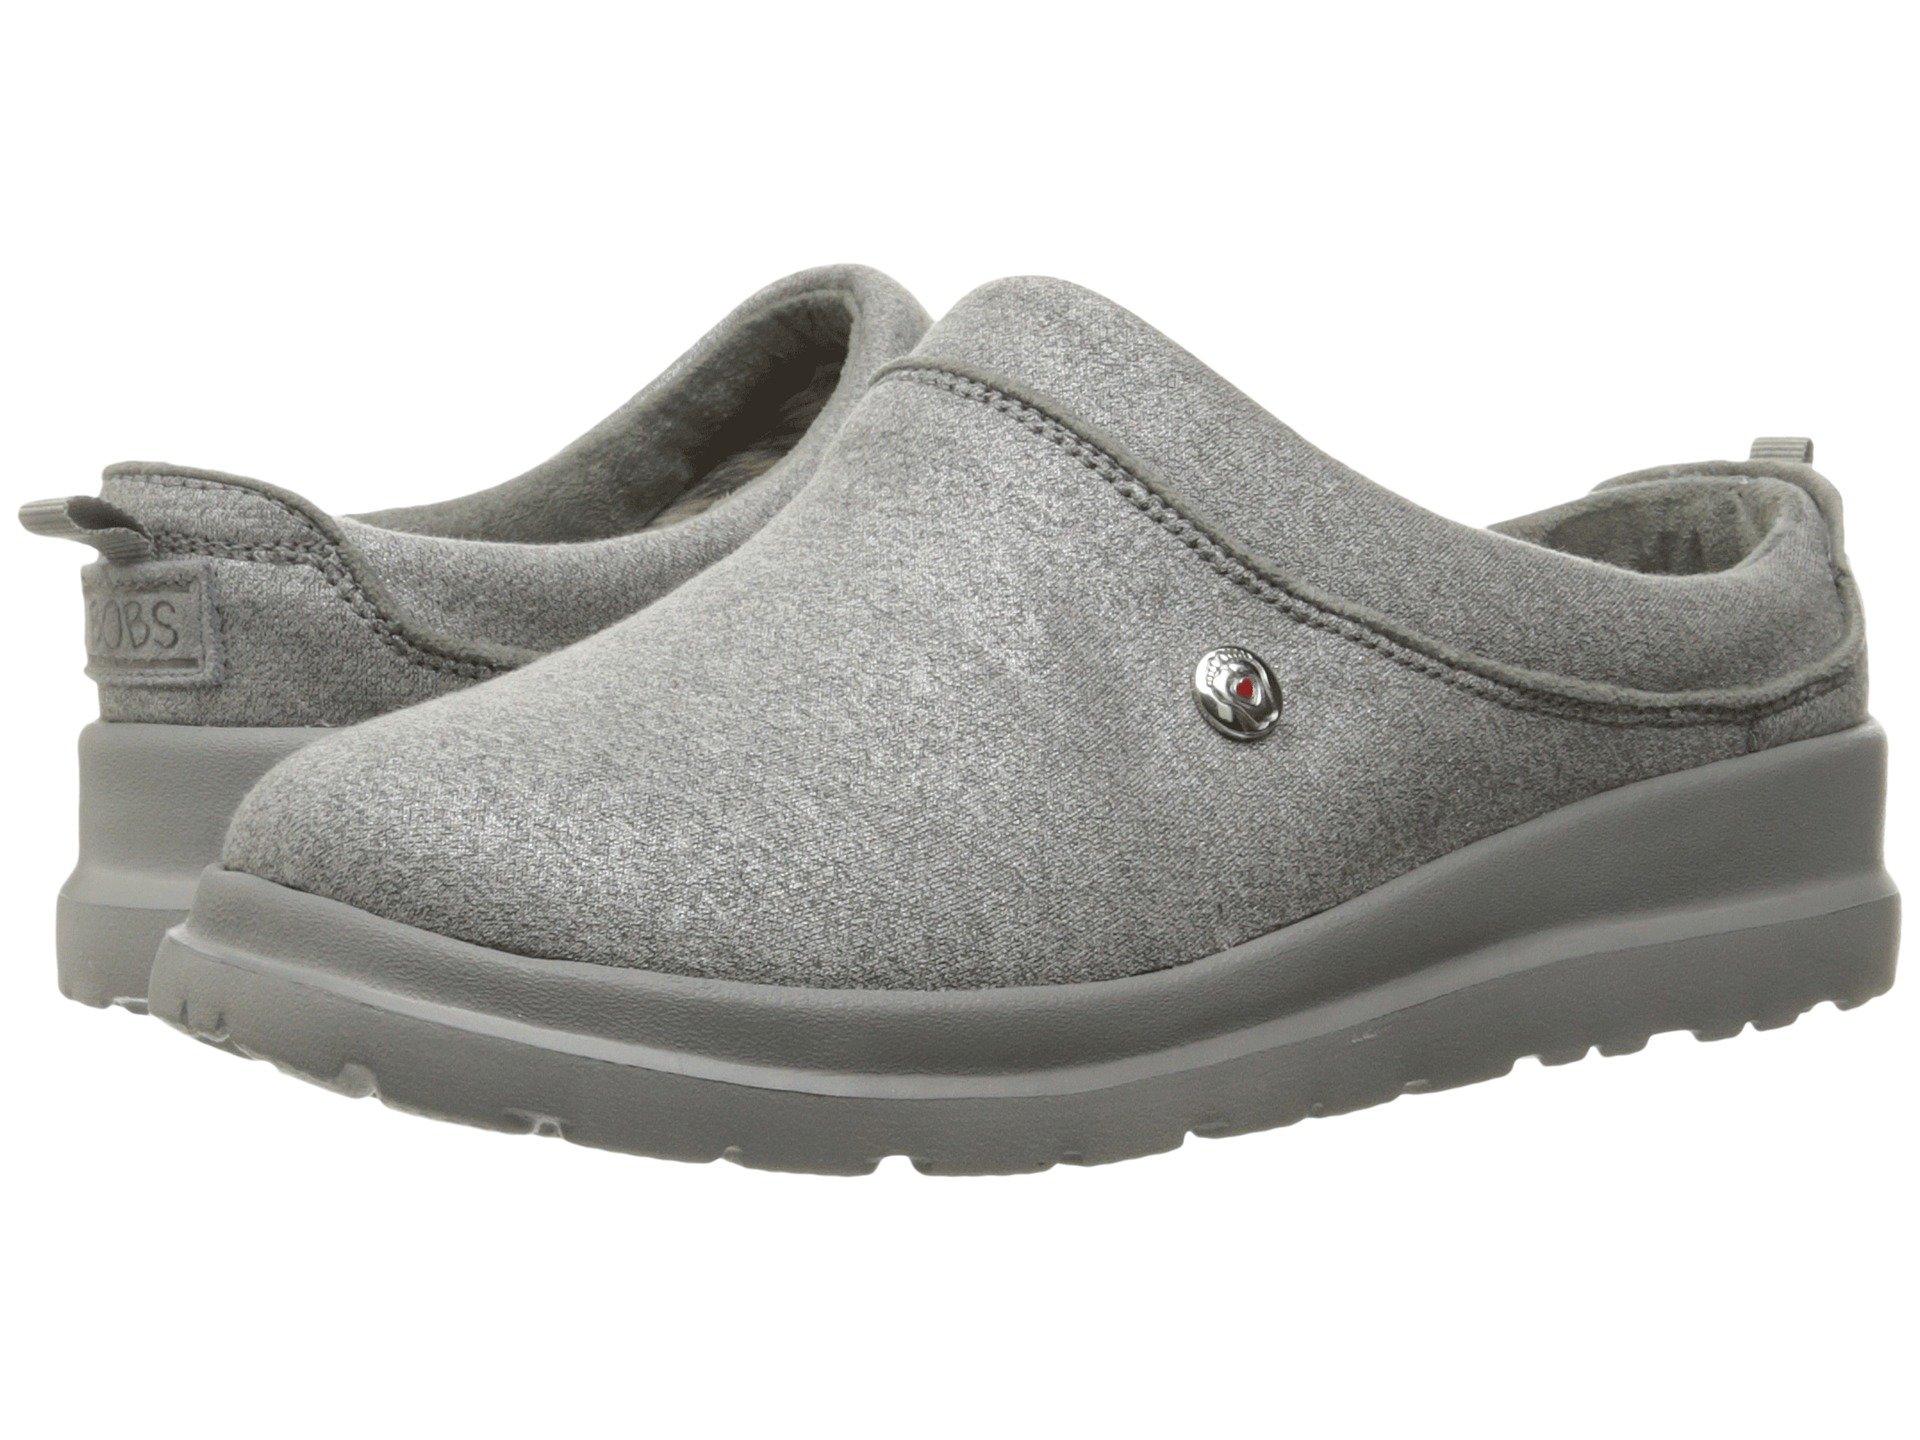 Zapato de Descanso para Mujer BOBS from SKECHERS Cherish - Sleigh Ride  + SKECHERS en VeoyCompro.net